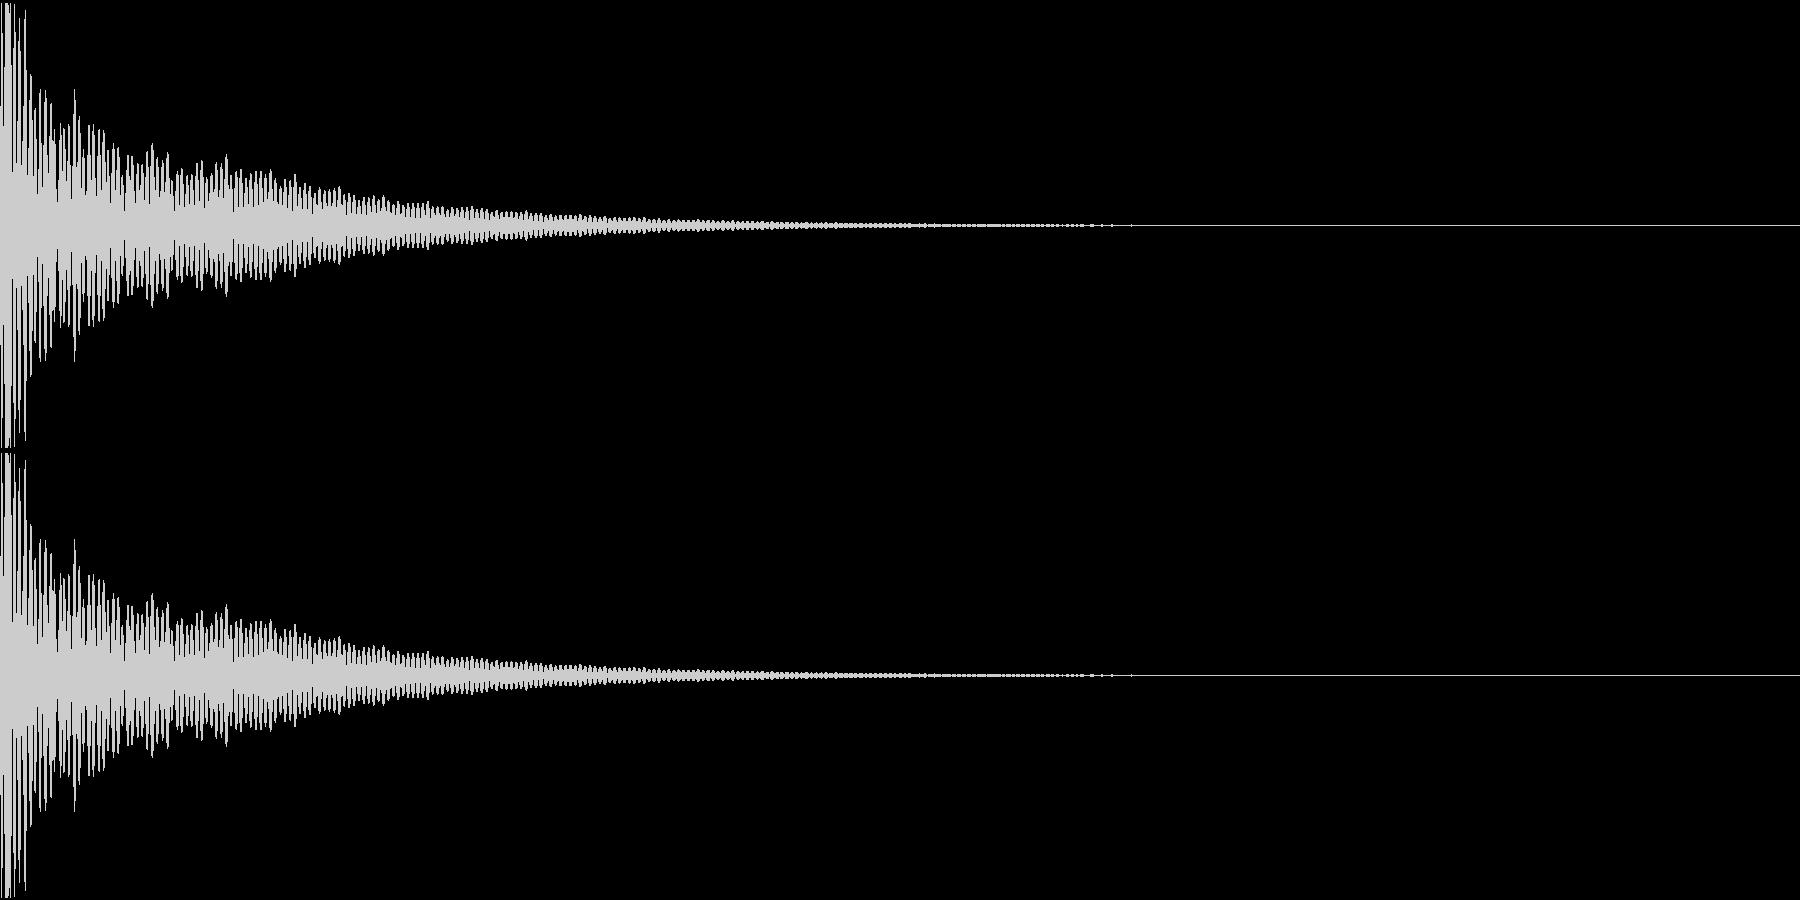 DTM Tom 23 オリジナル音源の未再生の波形